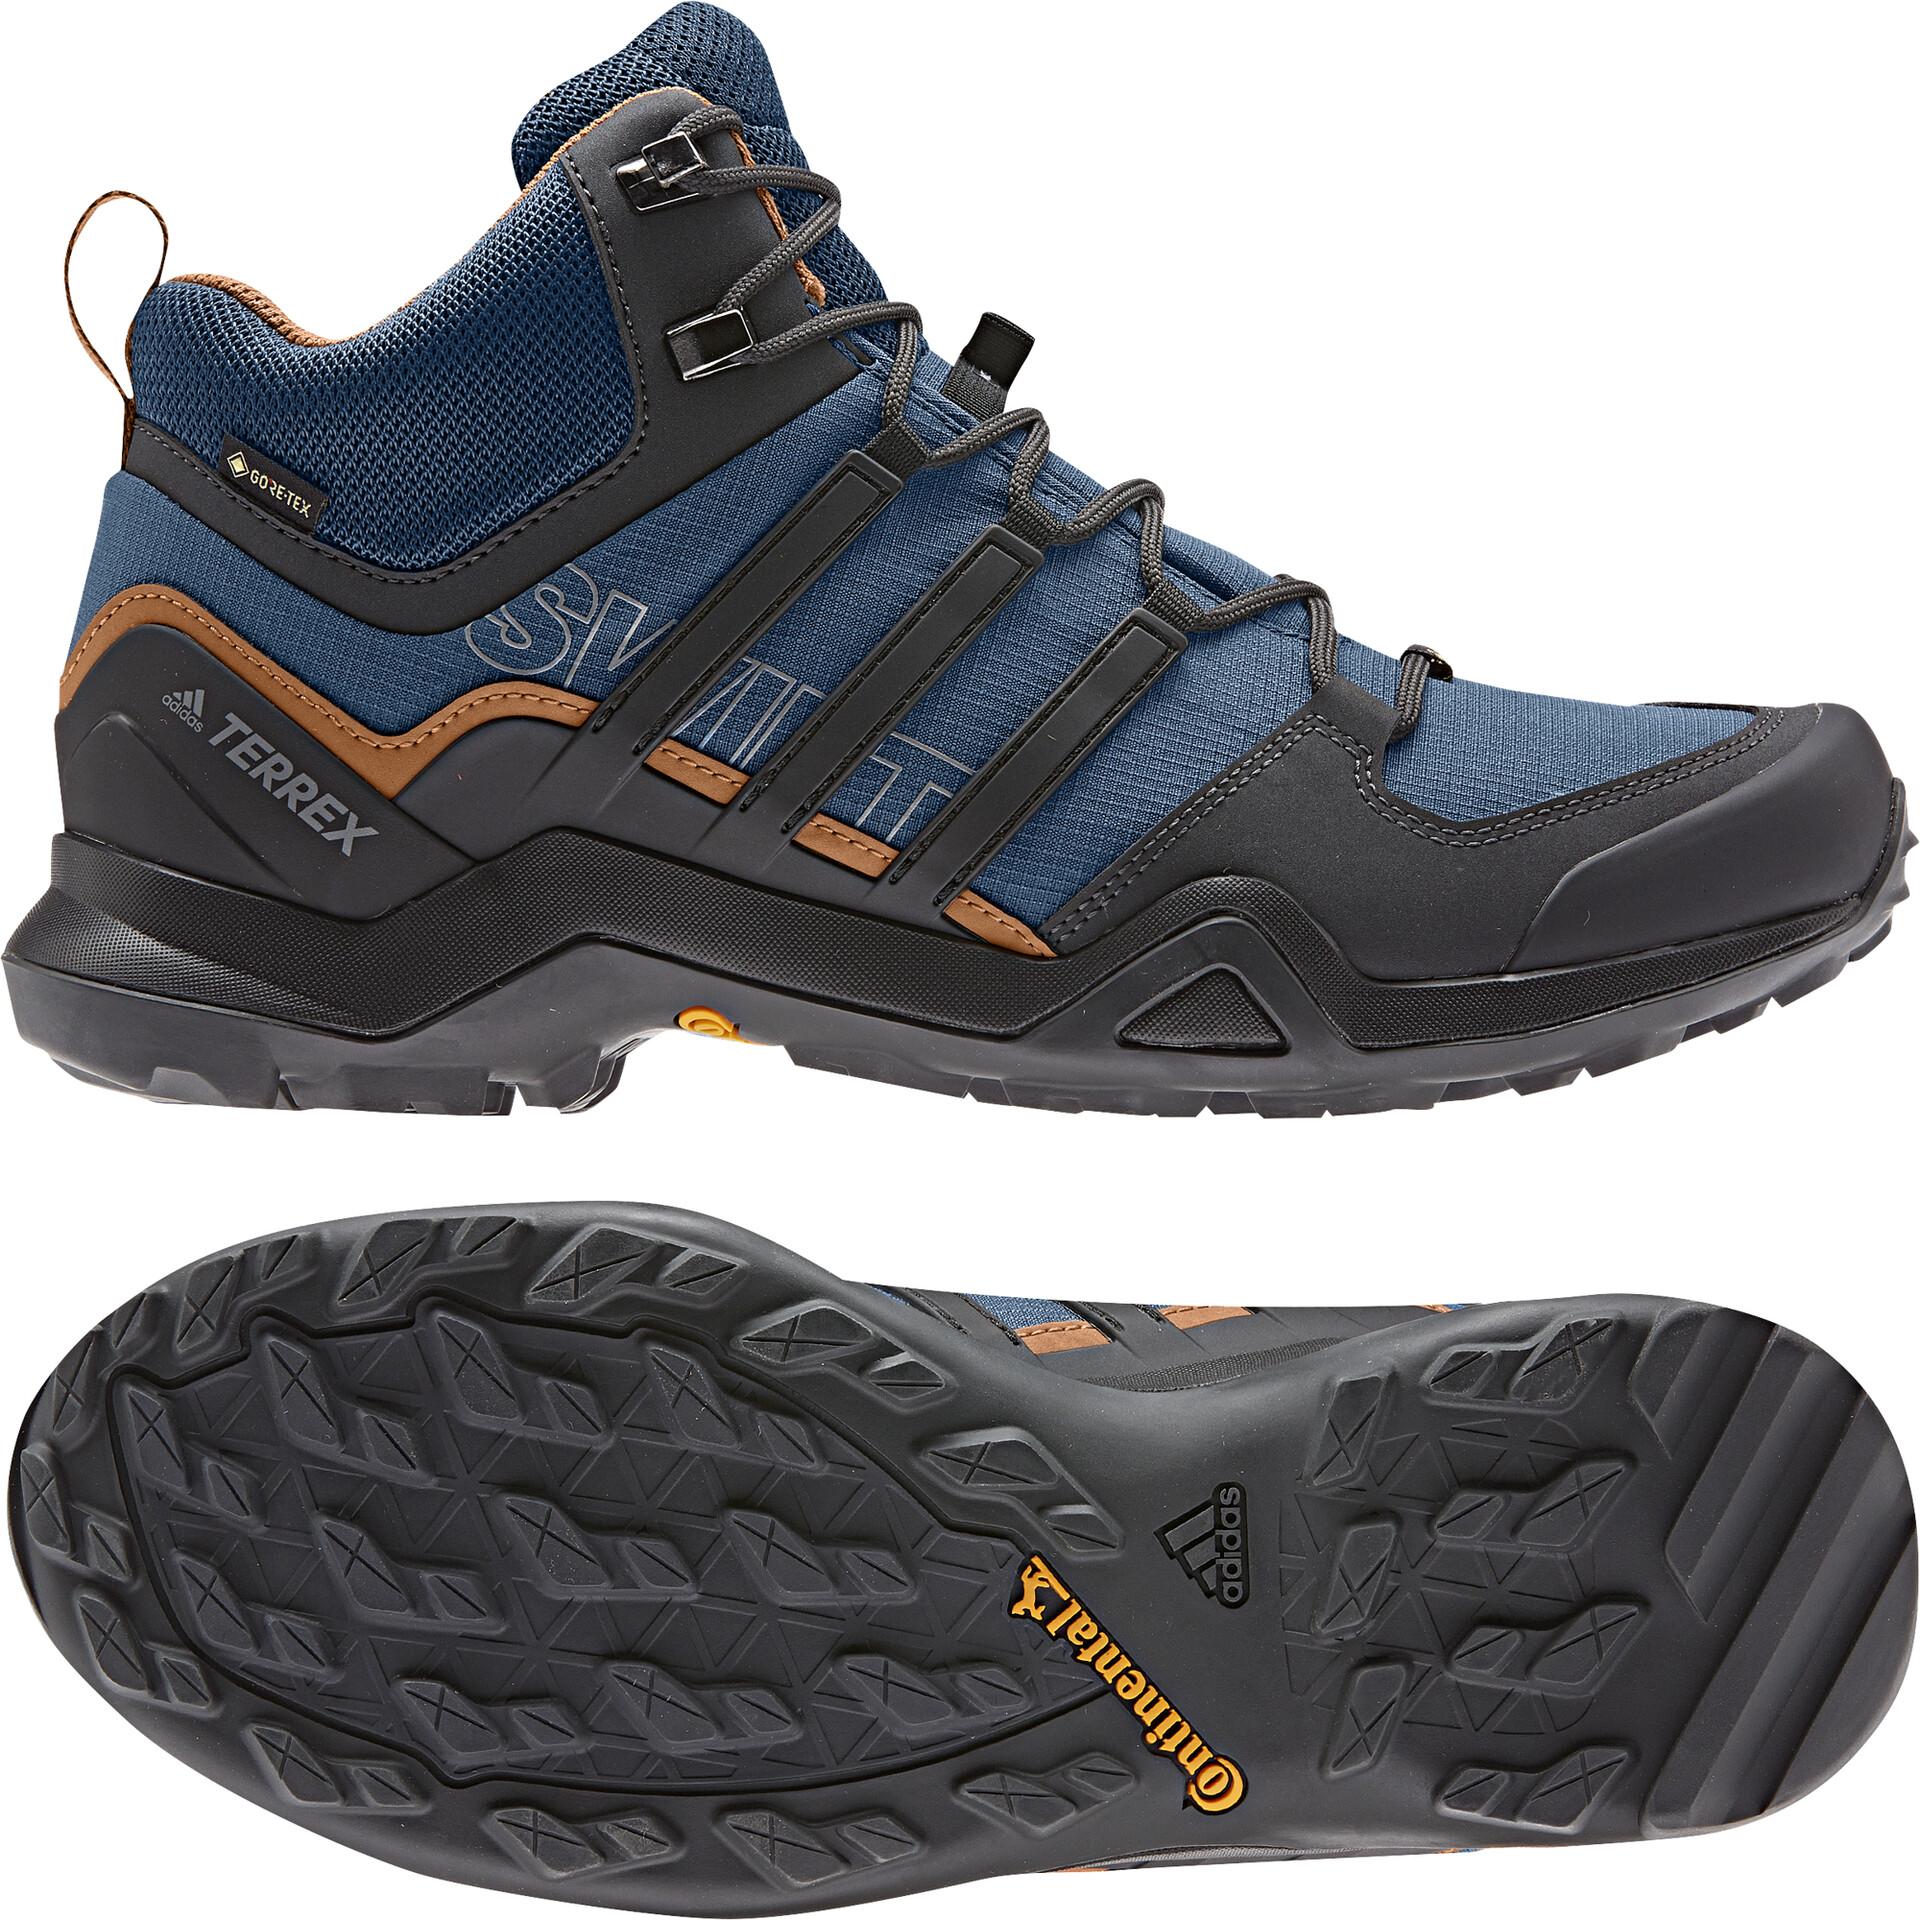 adidas TERREX Swift R2 Mid GTX Shoes Herren legend marinecore blacktech copper